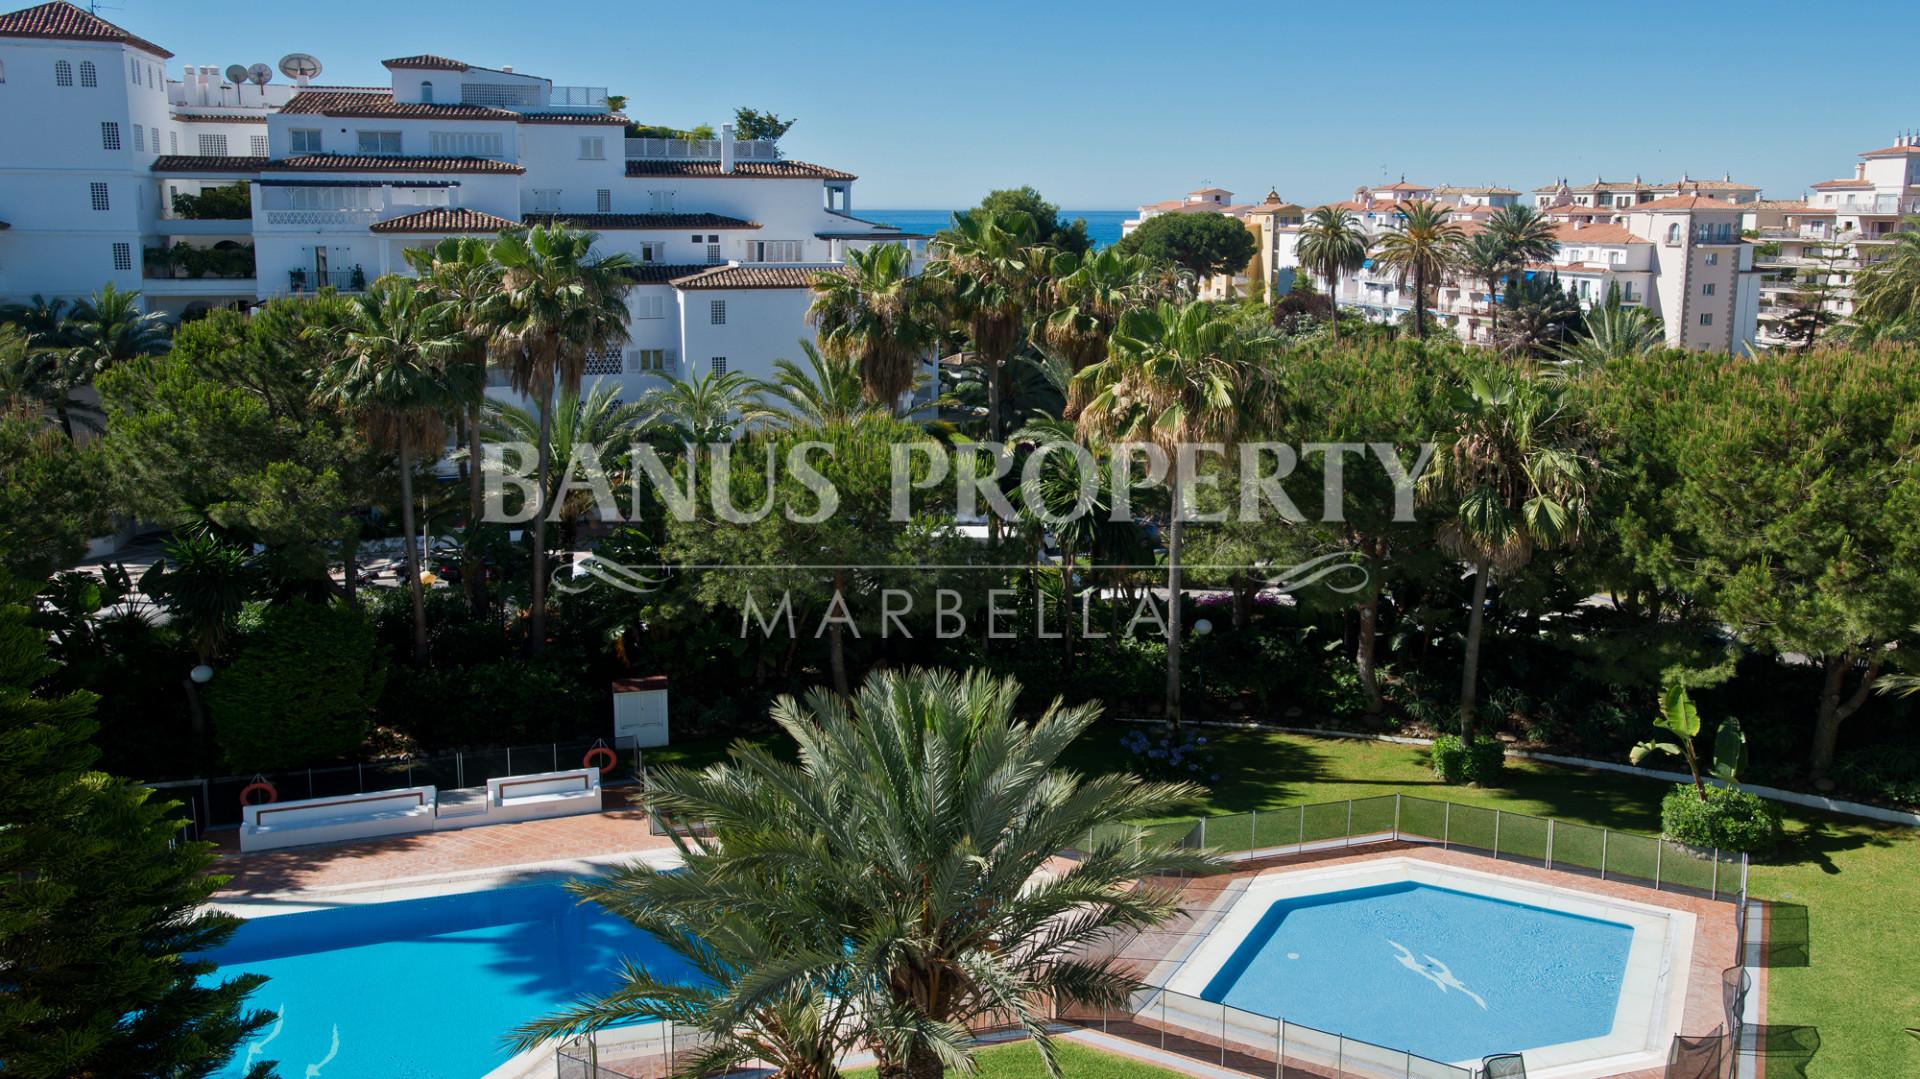 3 bedroom luxury apartment for sale in Las Gaviotas, Puerto Banus